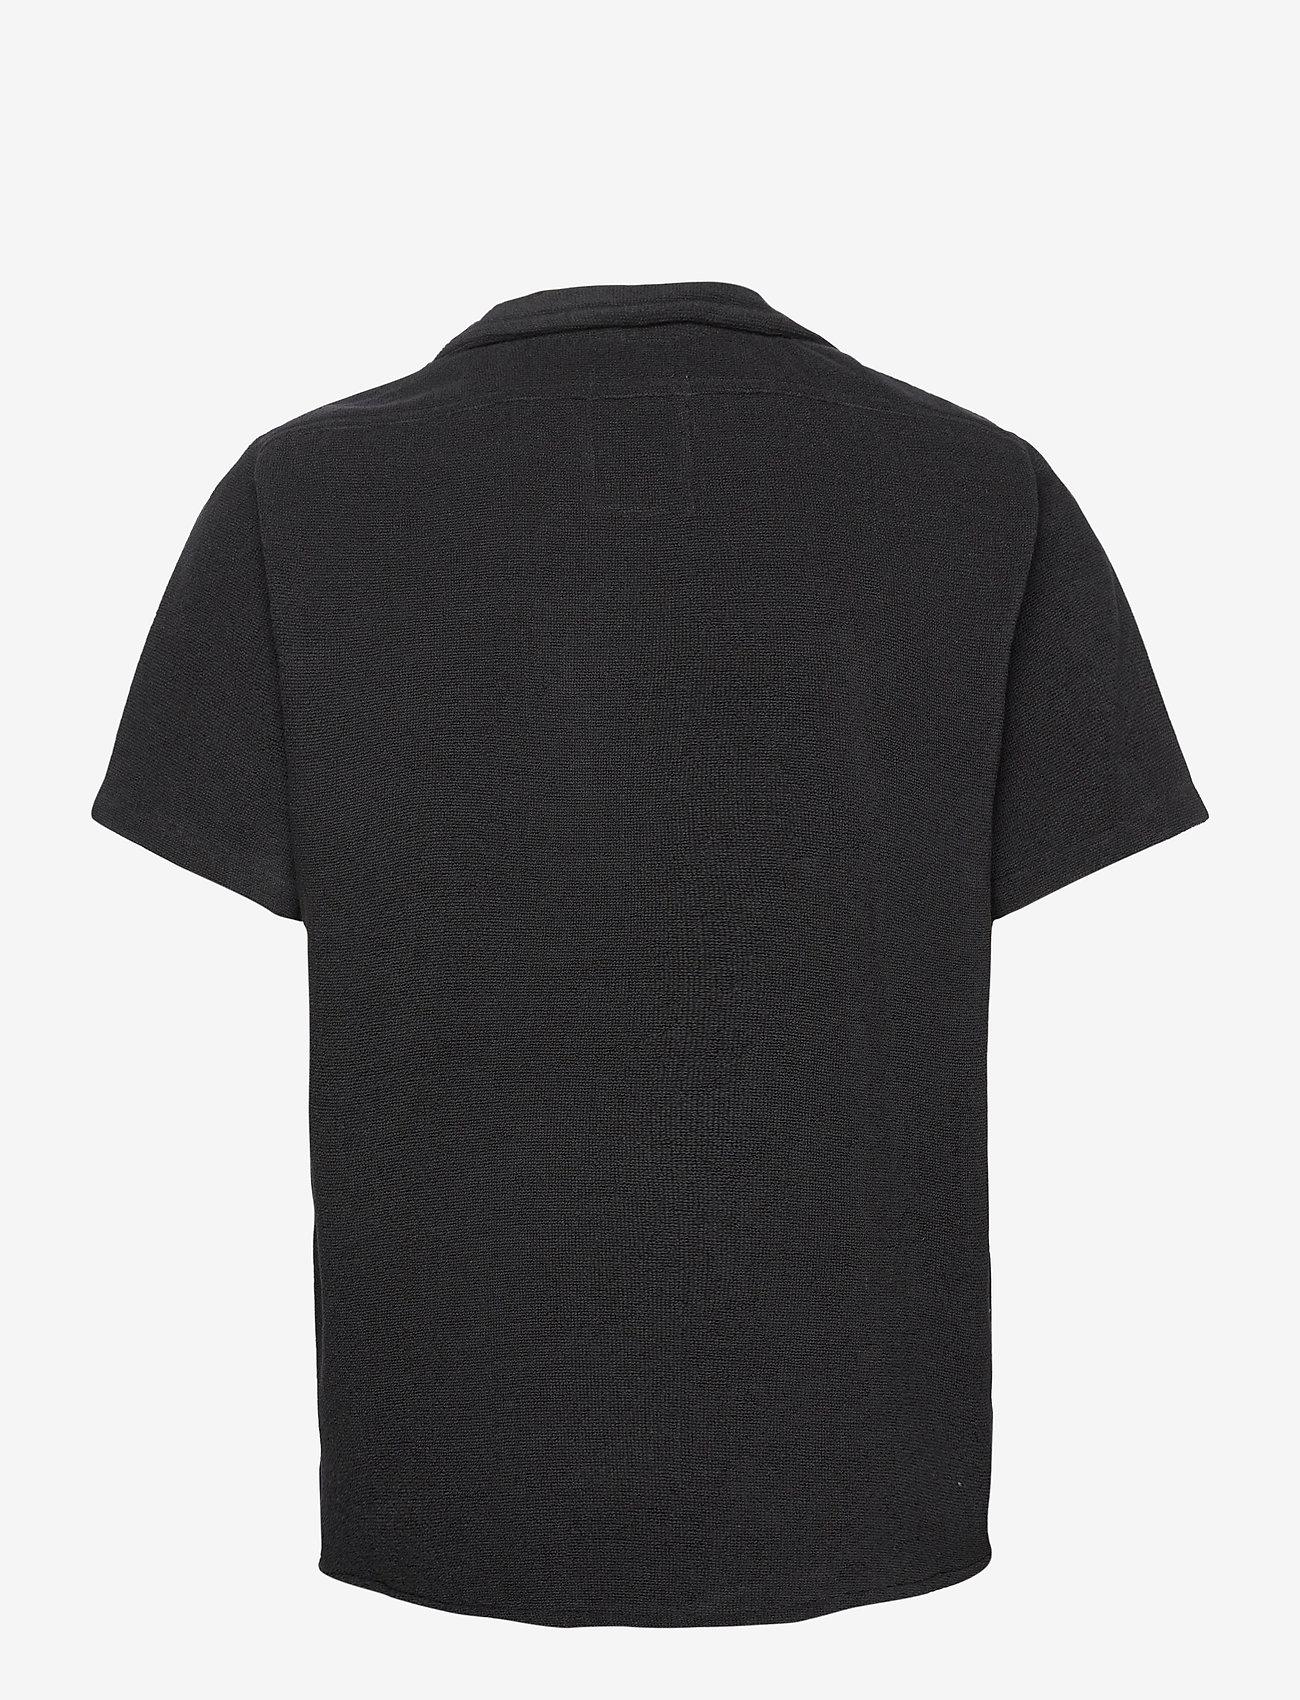 OAS - Black Cuba Terry Shirt - overhemden korte mouwen - black - 1